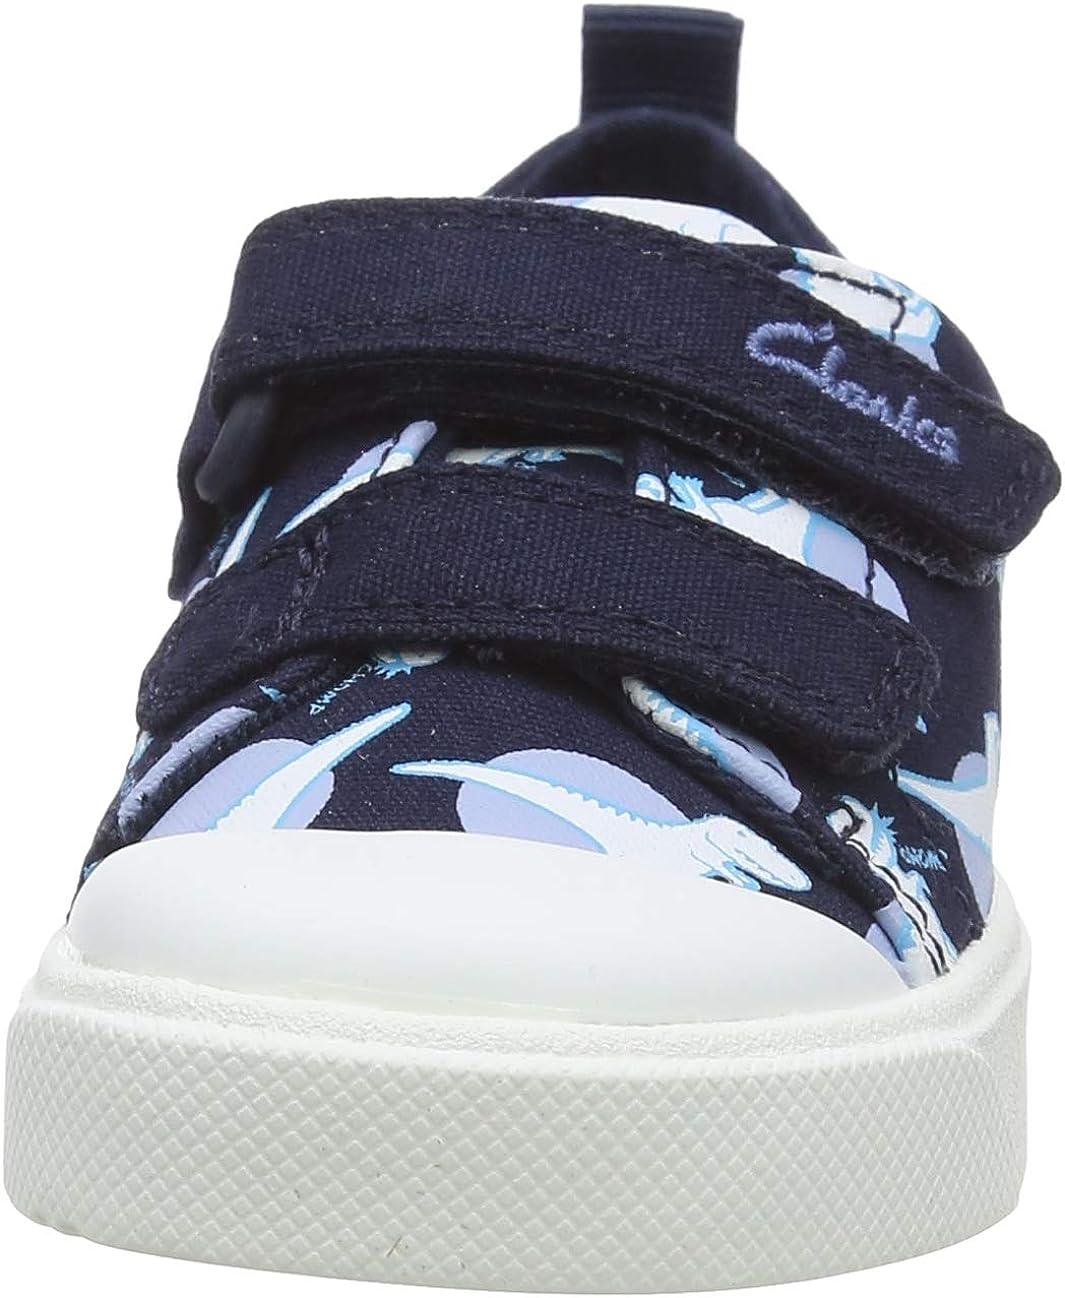 Sneakers Basses Mixte Enfant Clarks City Bright T